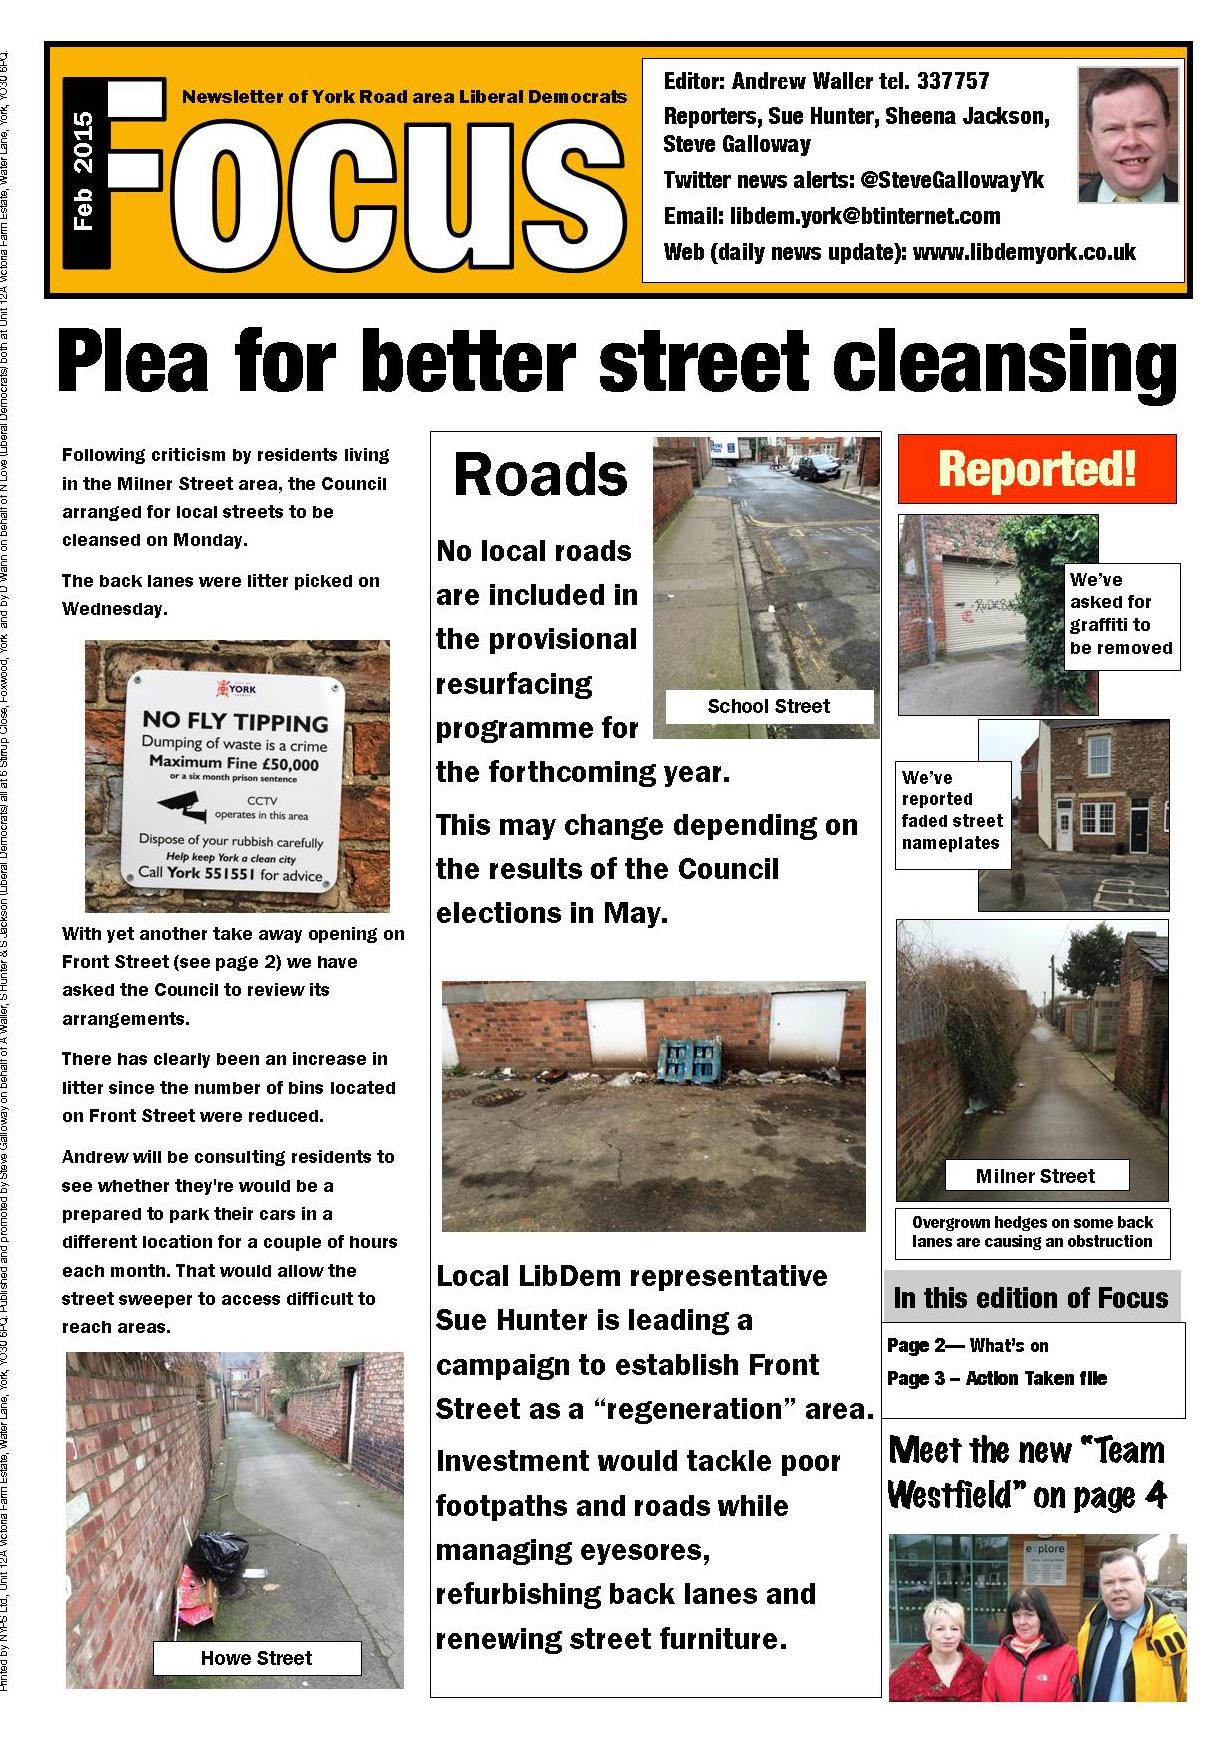 215 colour York Road pages 1 380 Focus Feb 15 A3